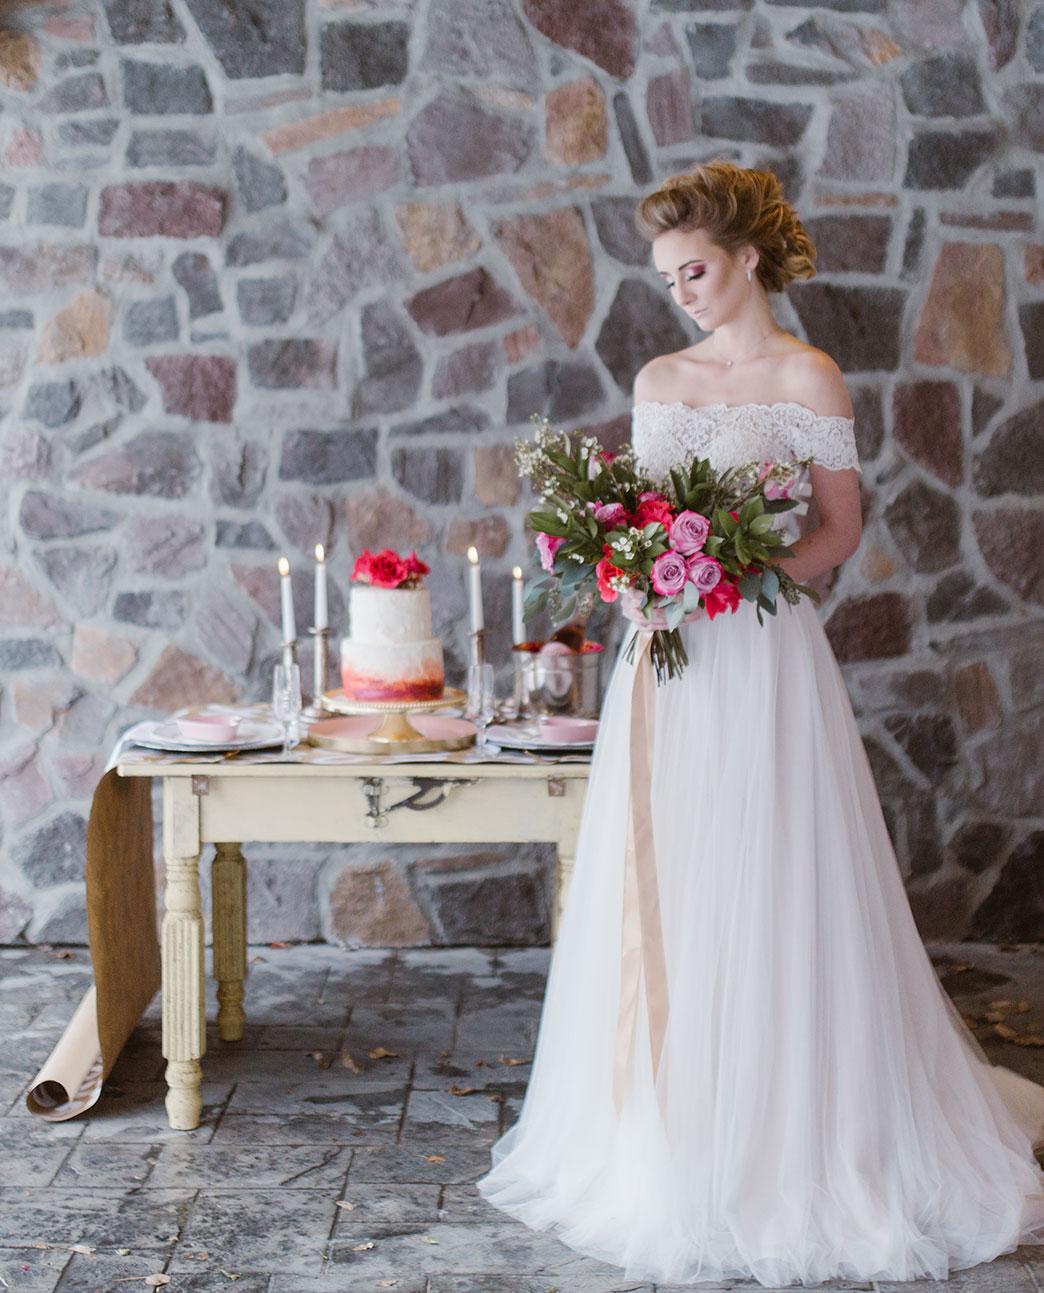 Venue Plume Bridal Florist Montana Magnolia Formally Bloom Cake Cakes By Jenn Wedding Dress Essence Of Australia Le Petite Chateau